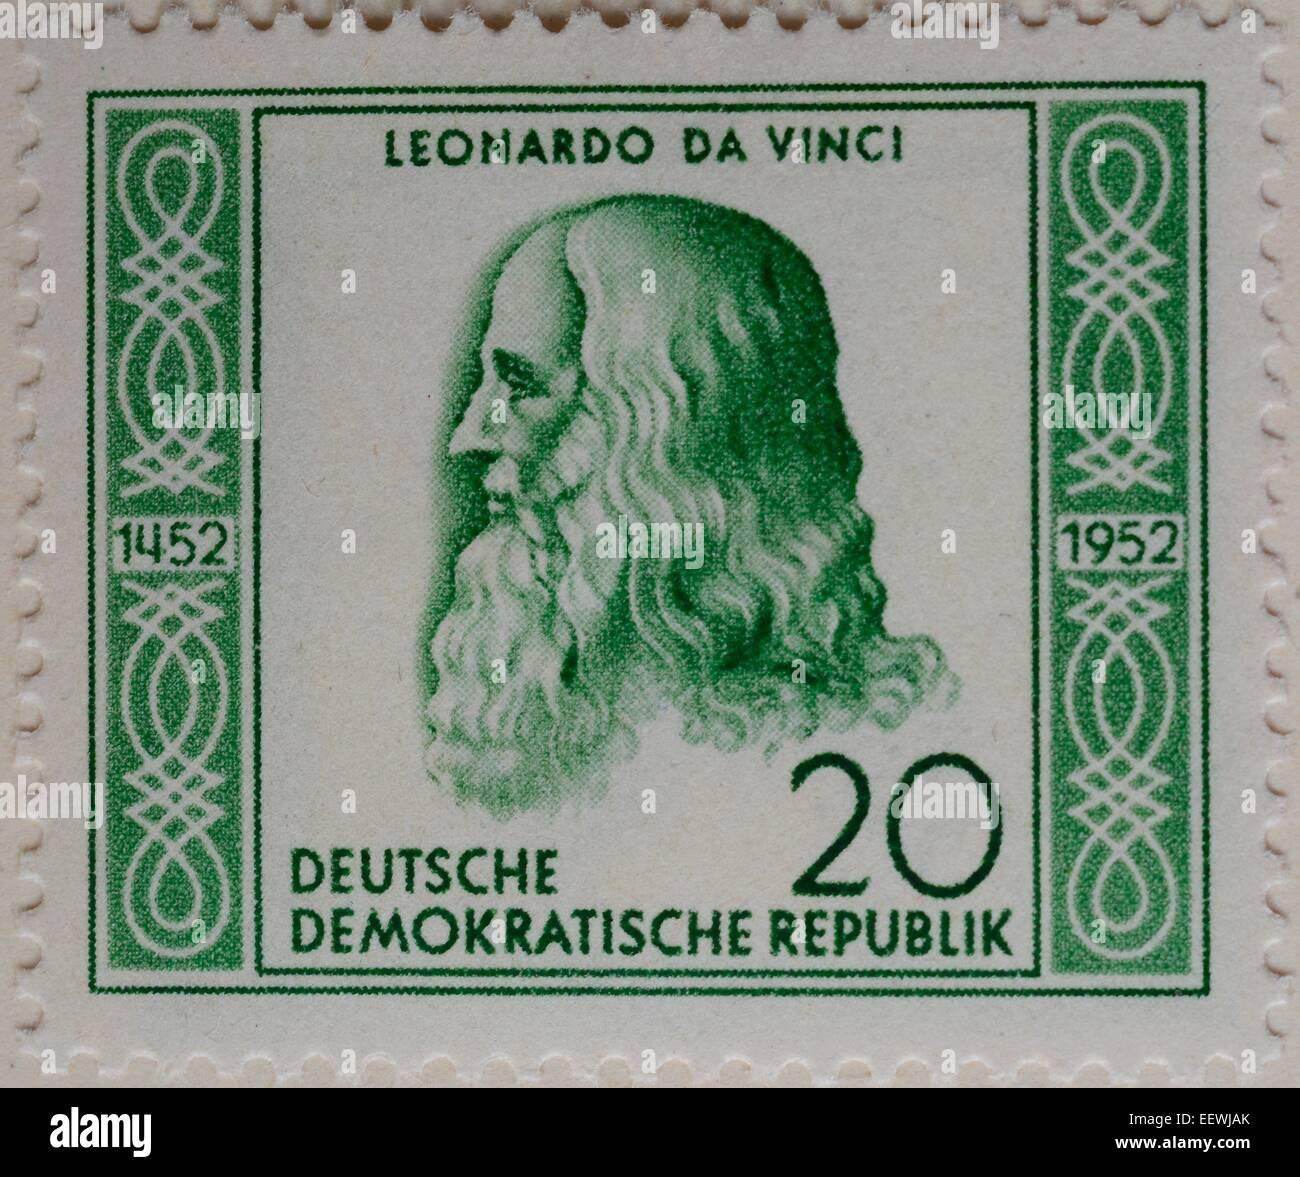 Leonardo da Vinci, artista e intelectual del renacimiento italiano, retrato de un sello alemán, RDA, 1952 Foto de stock